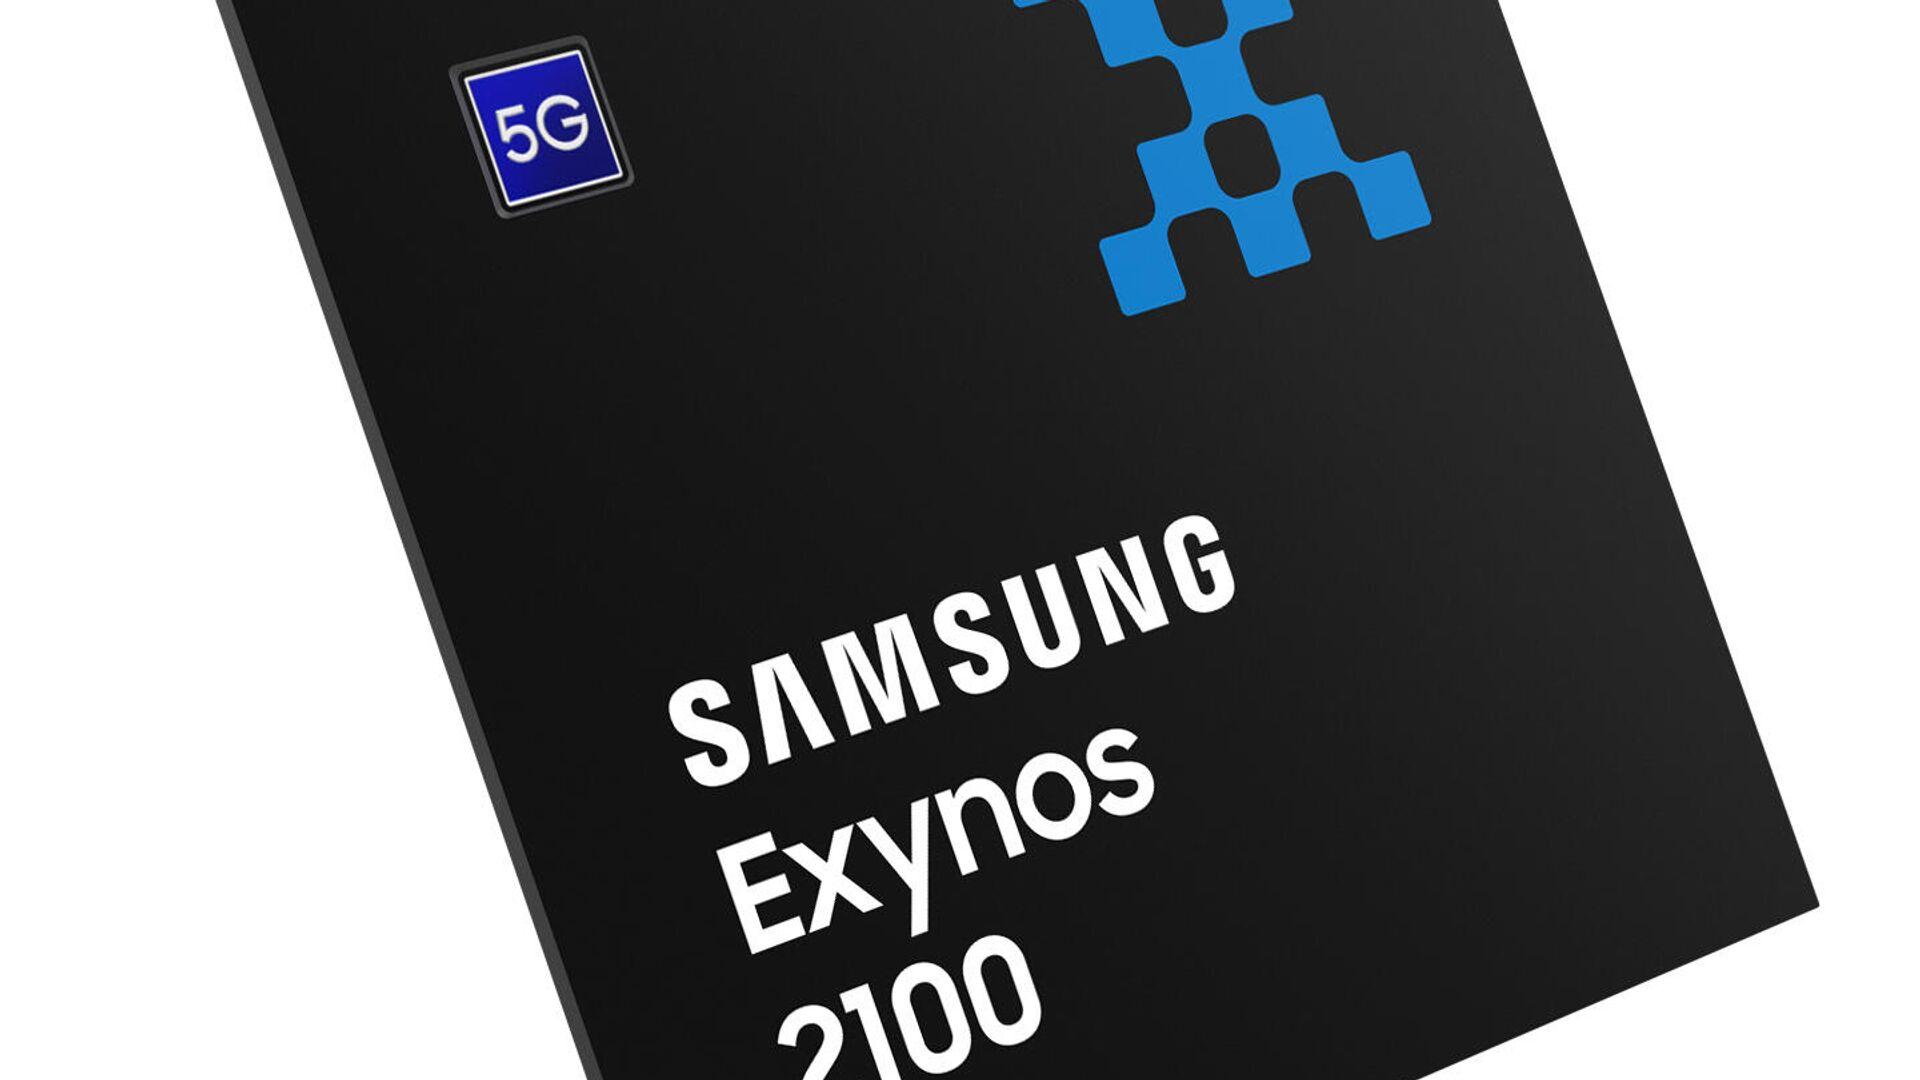 Samsung Exynos 2100 - РИА Новости, 1920, 12.01.2021